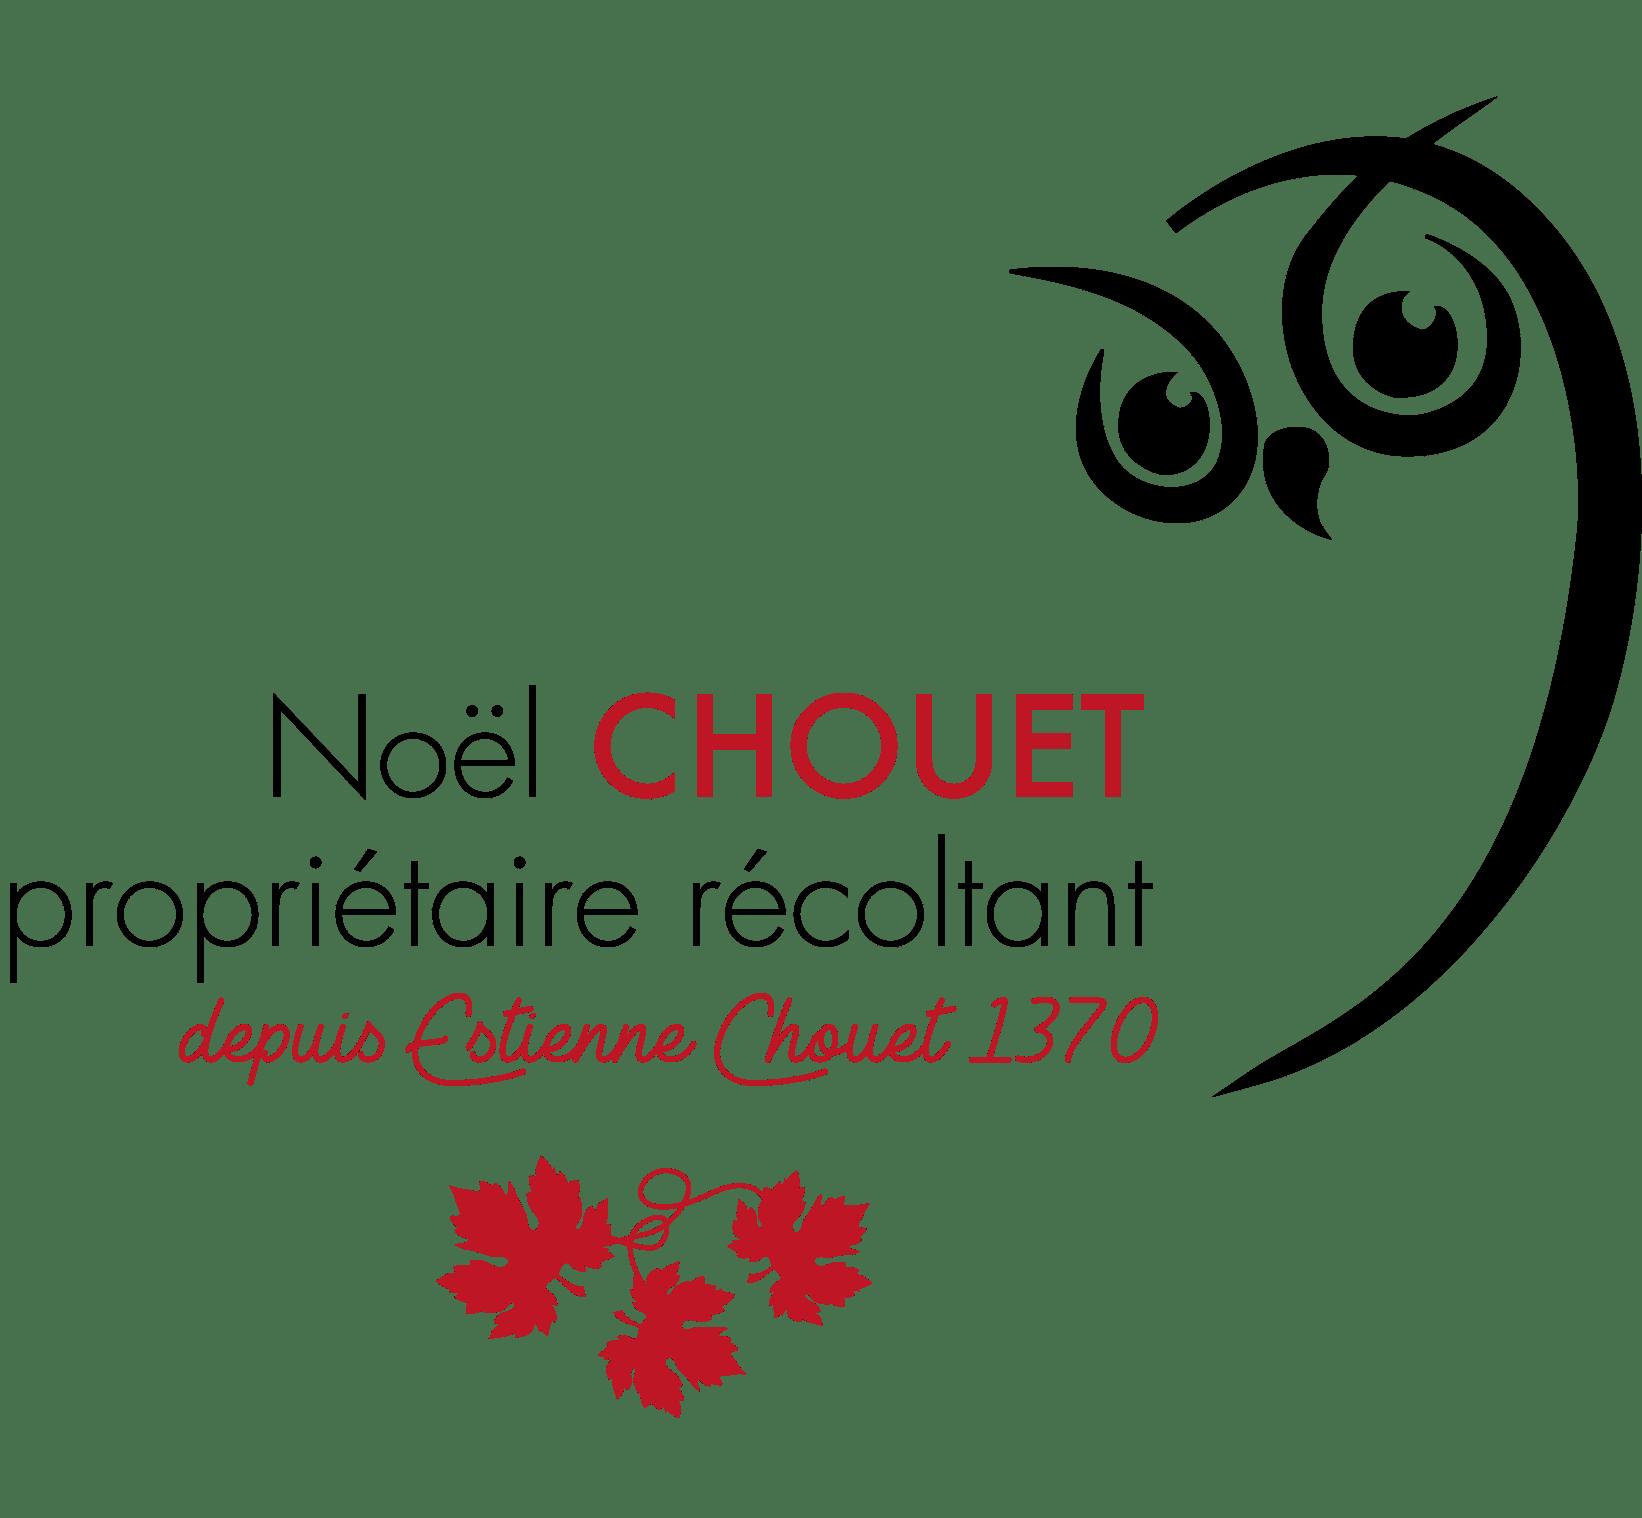 Noel Chouet Vins à Meursault